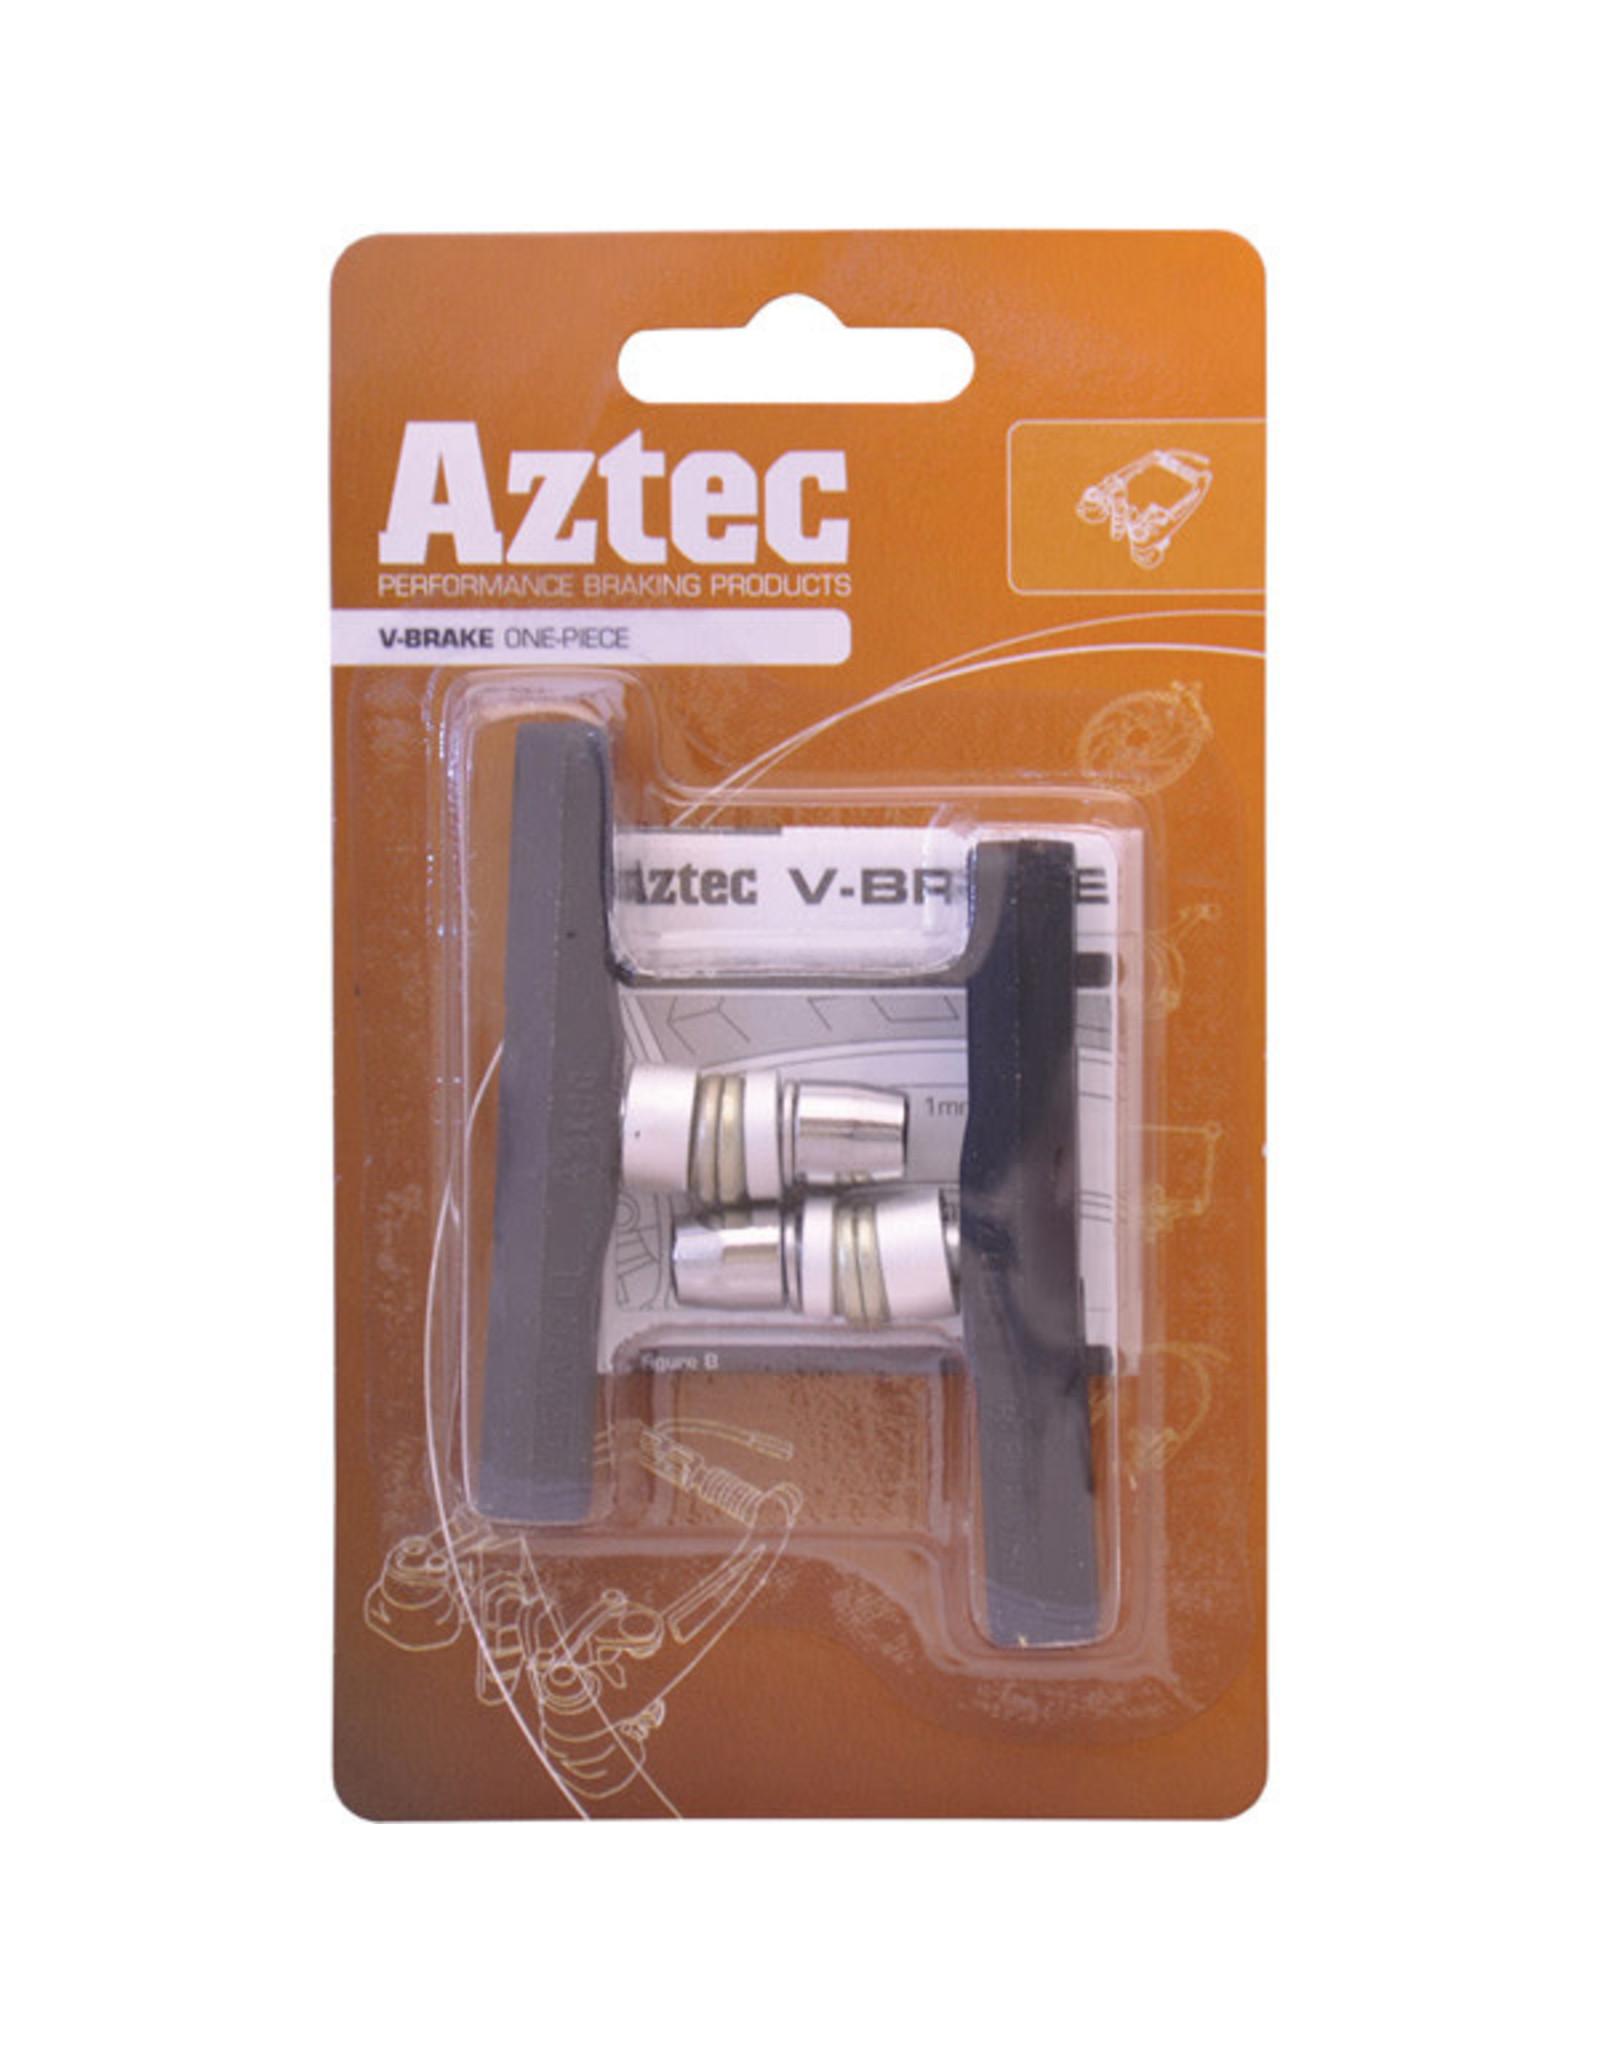 Aztec Brake Pads V-Brake One Piece Aztec